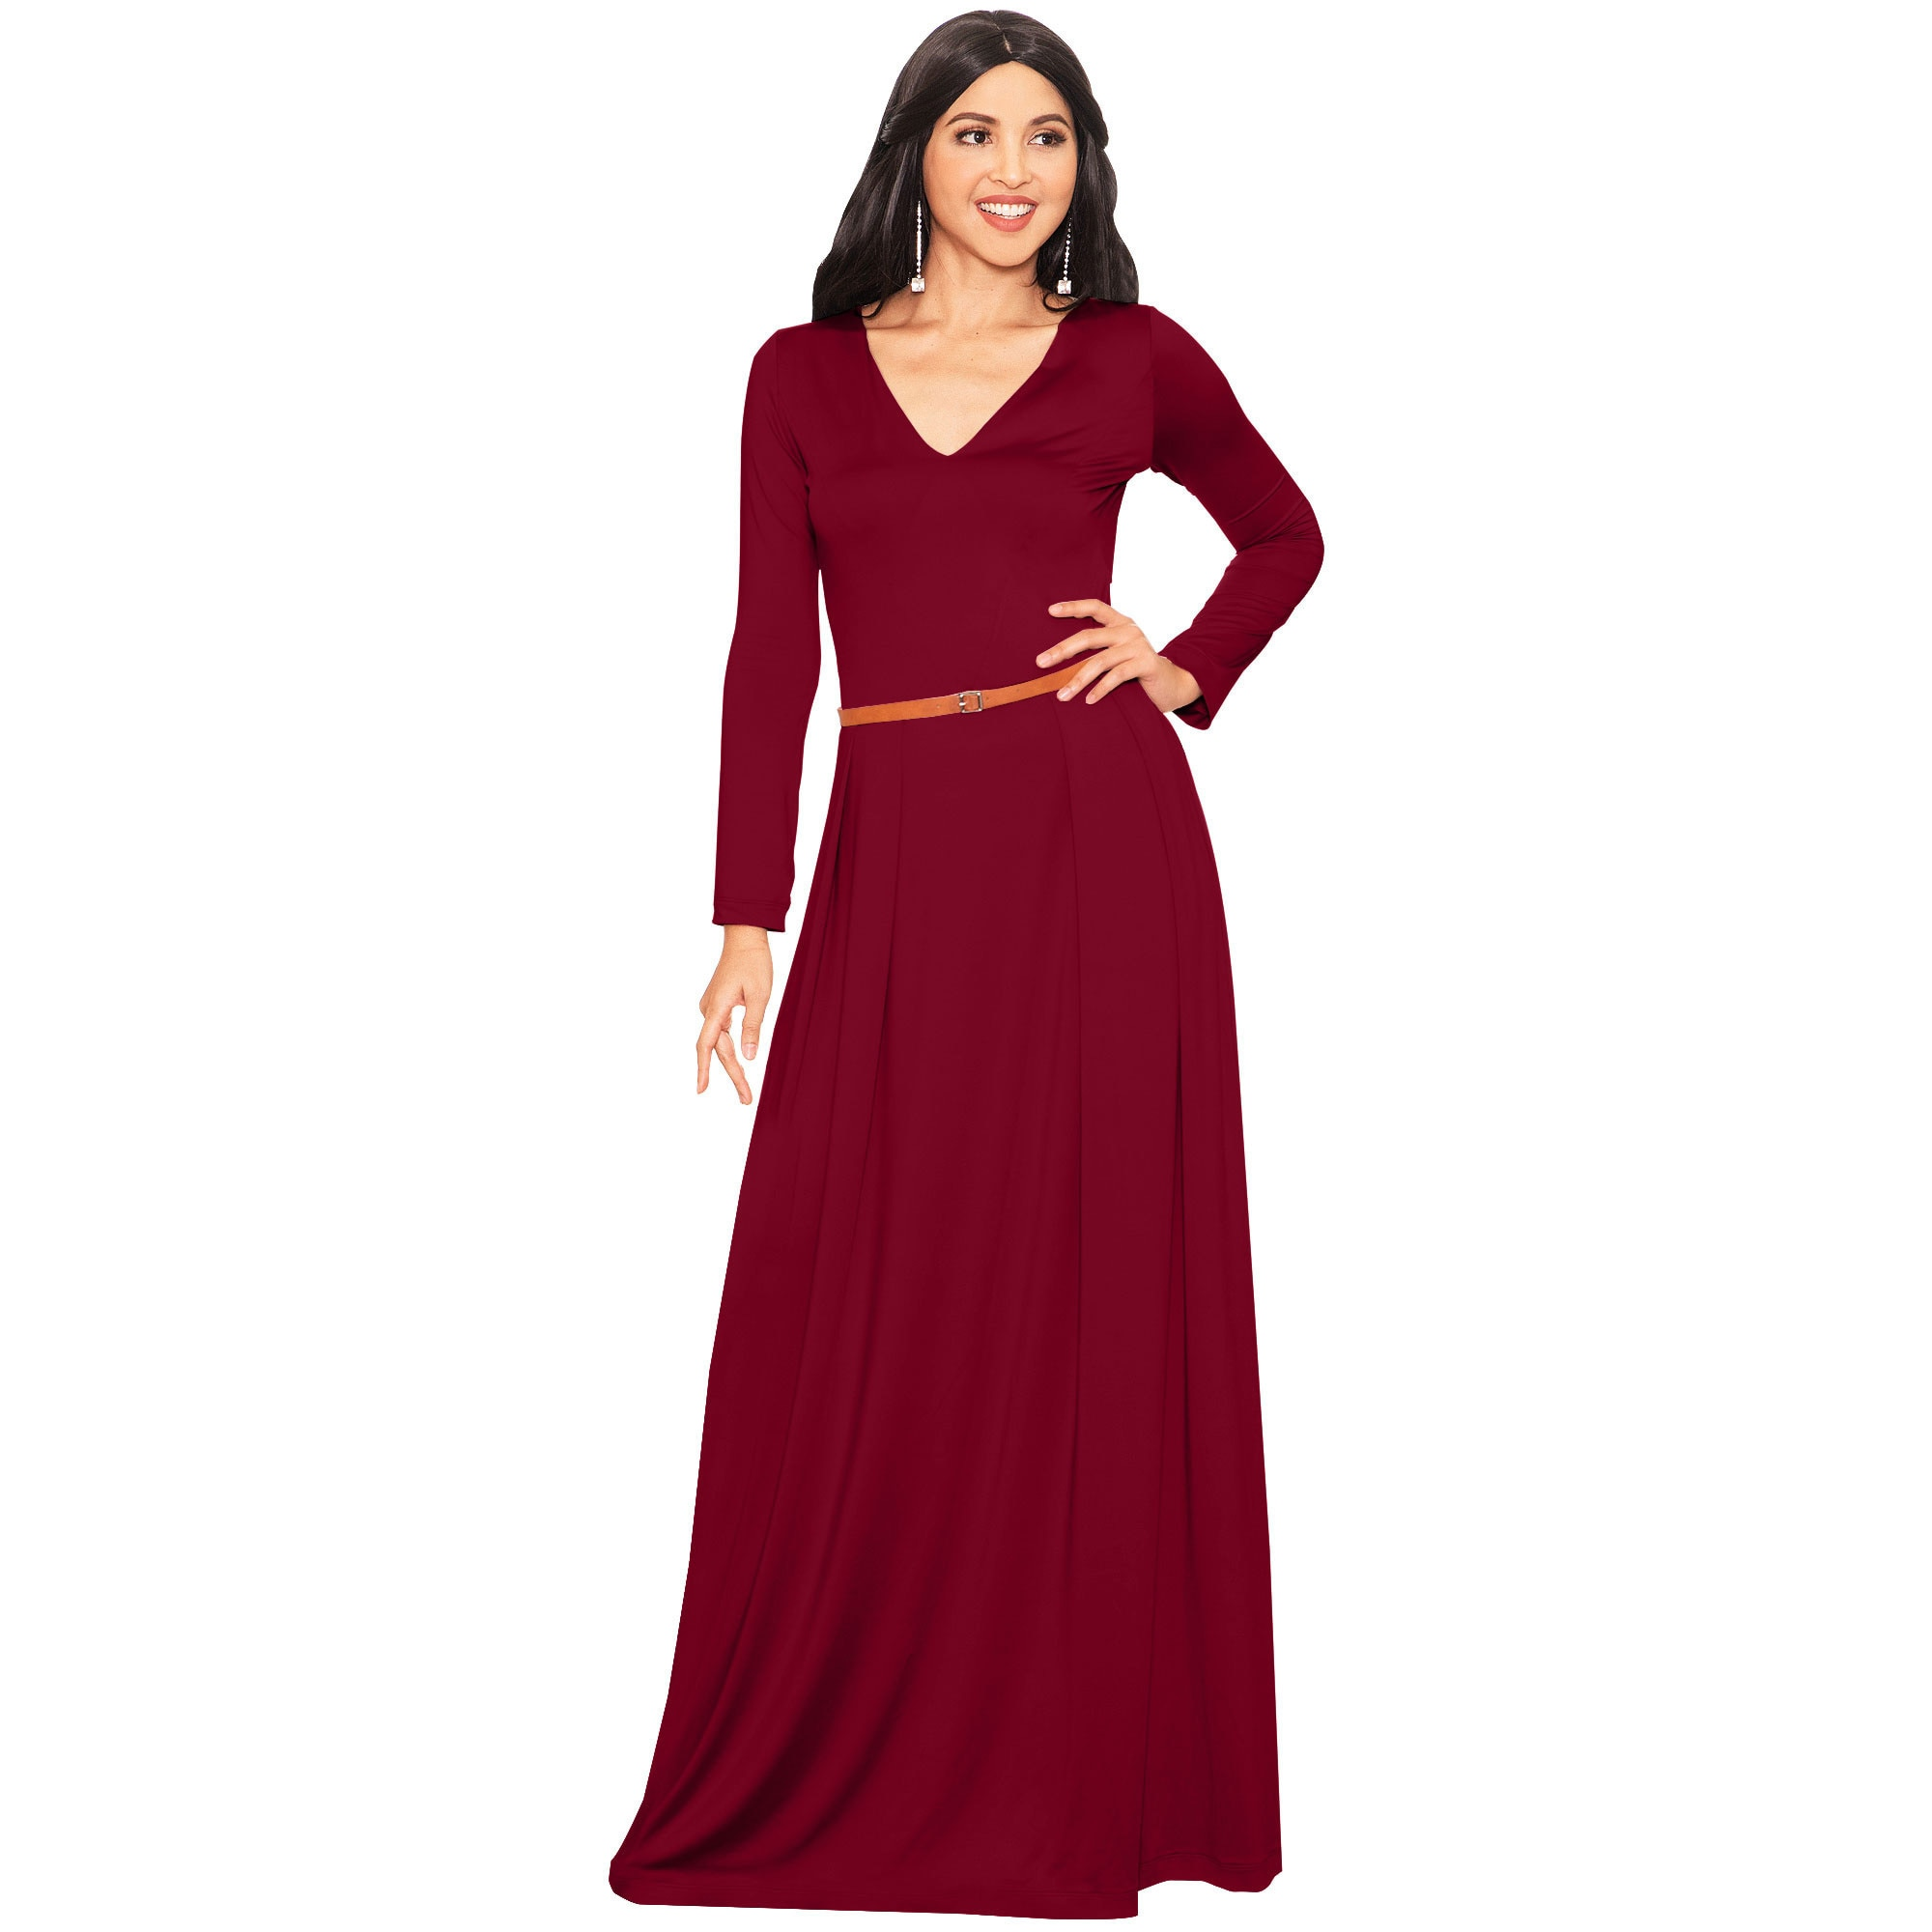 79a8648320e817 KOH KOH Long Sleeve Elegant Evening Flowy Dressy Fall Maxi Dress ...